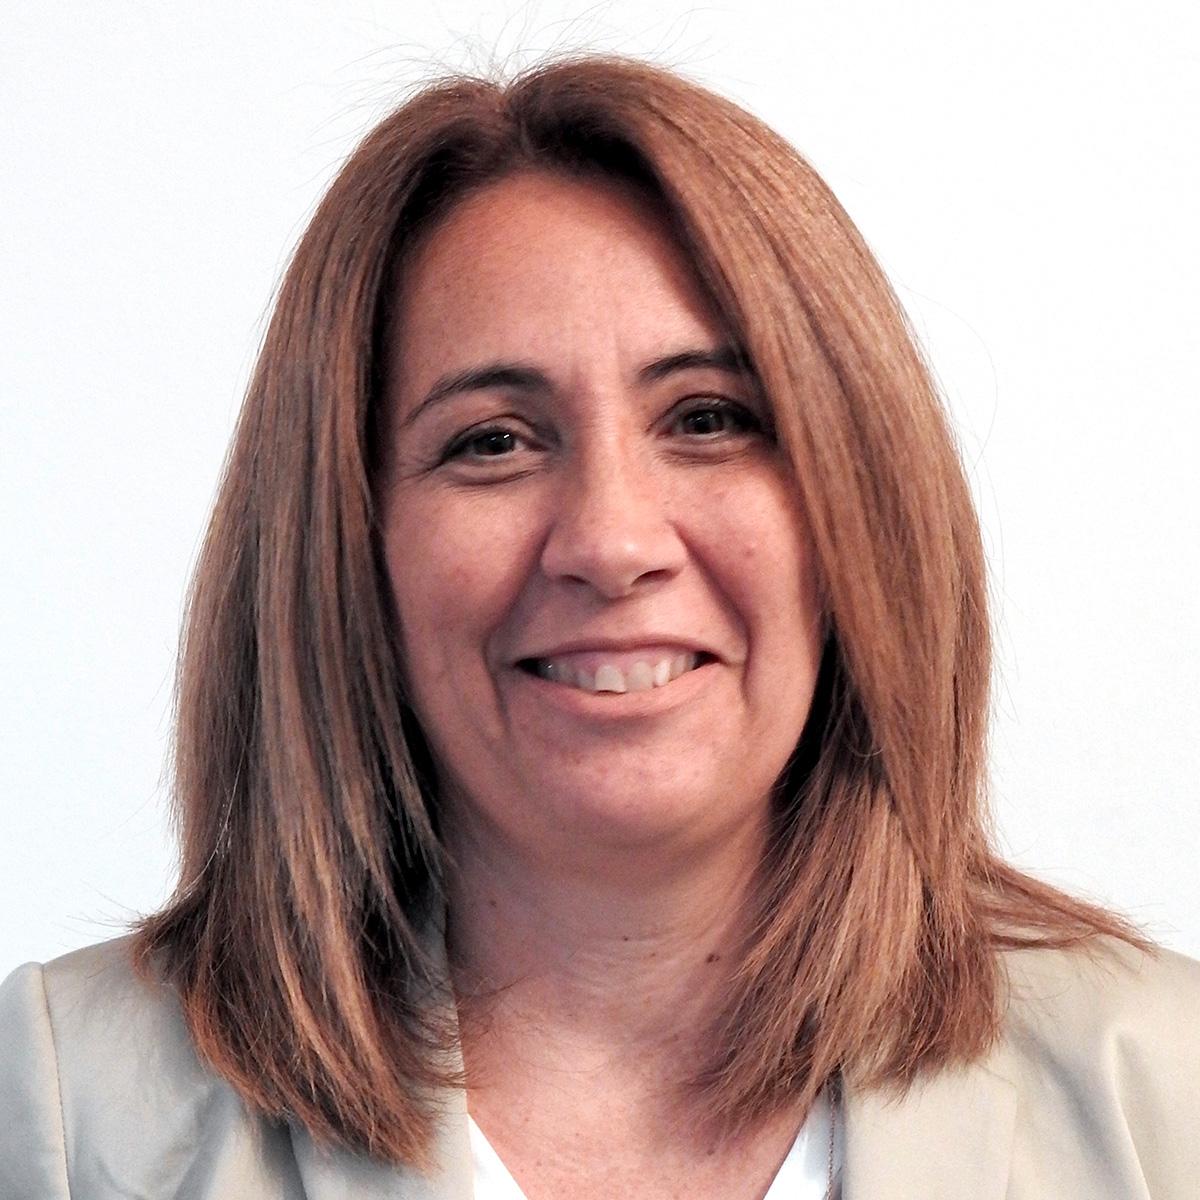 Silvia Tato